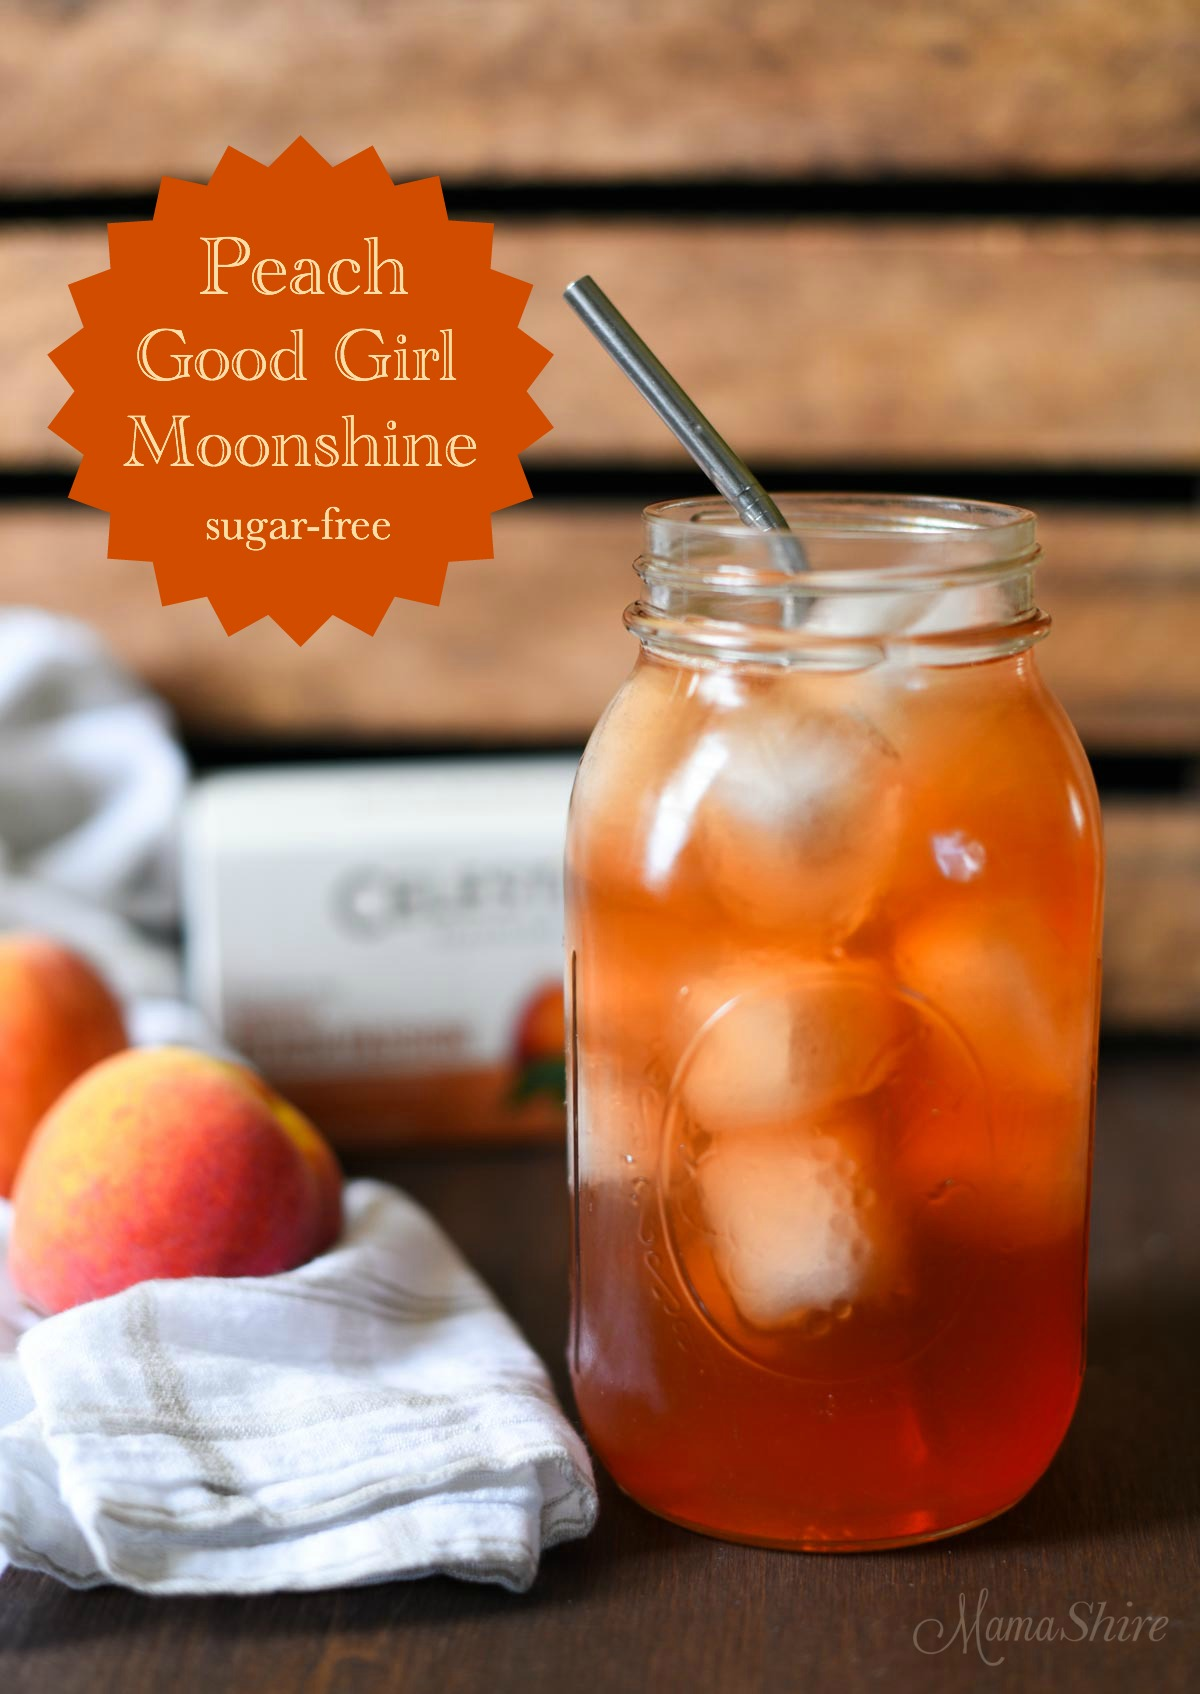 Peach Good Girl Moonshine